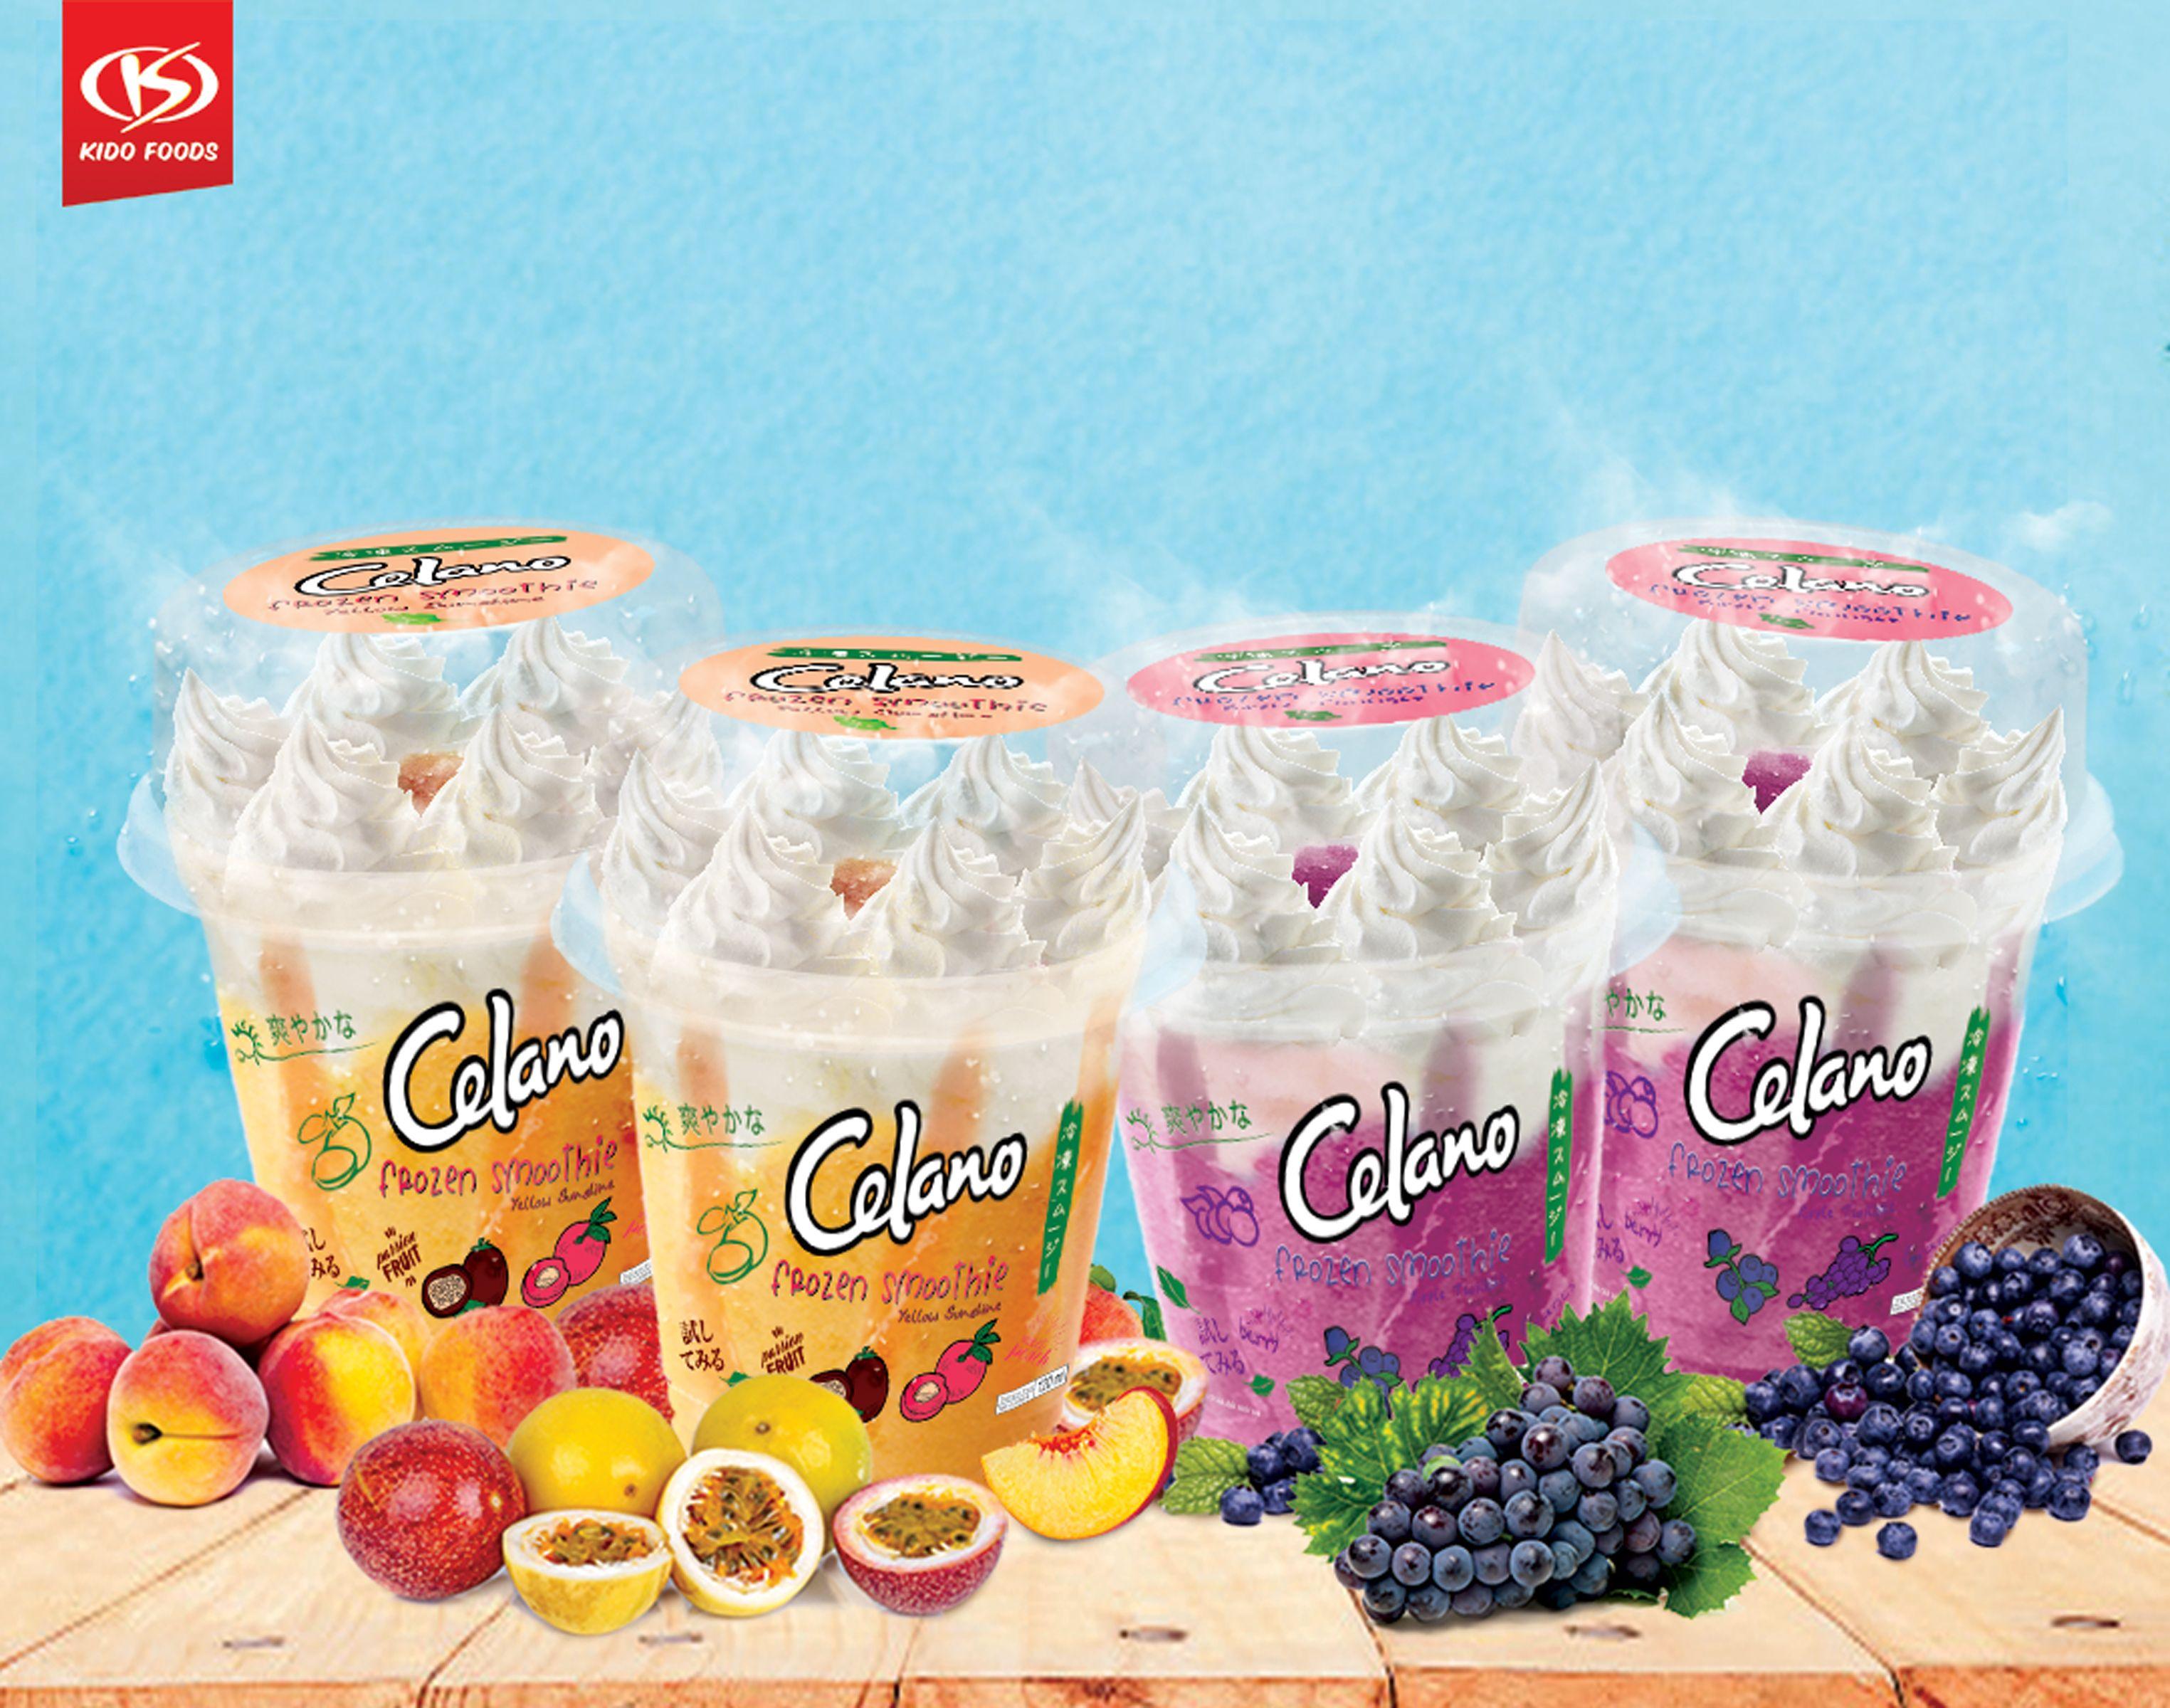 KDF achieves 17 per cent revenue growth as ice-cream sales zoom